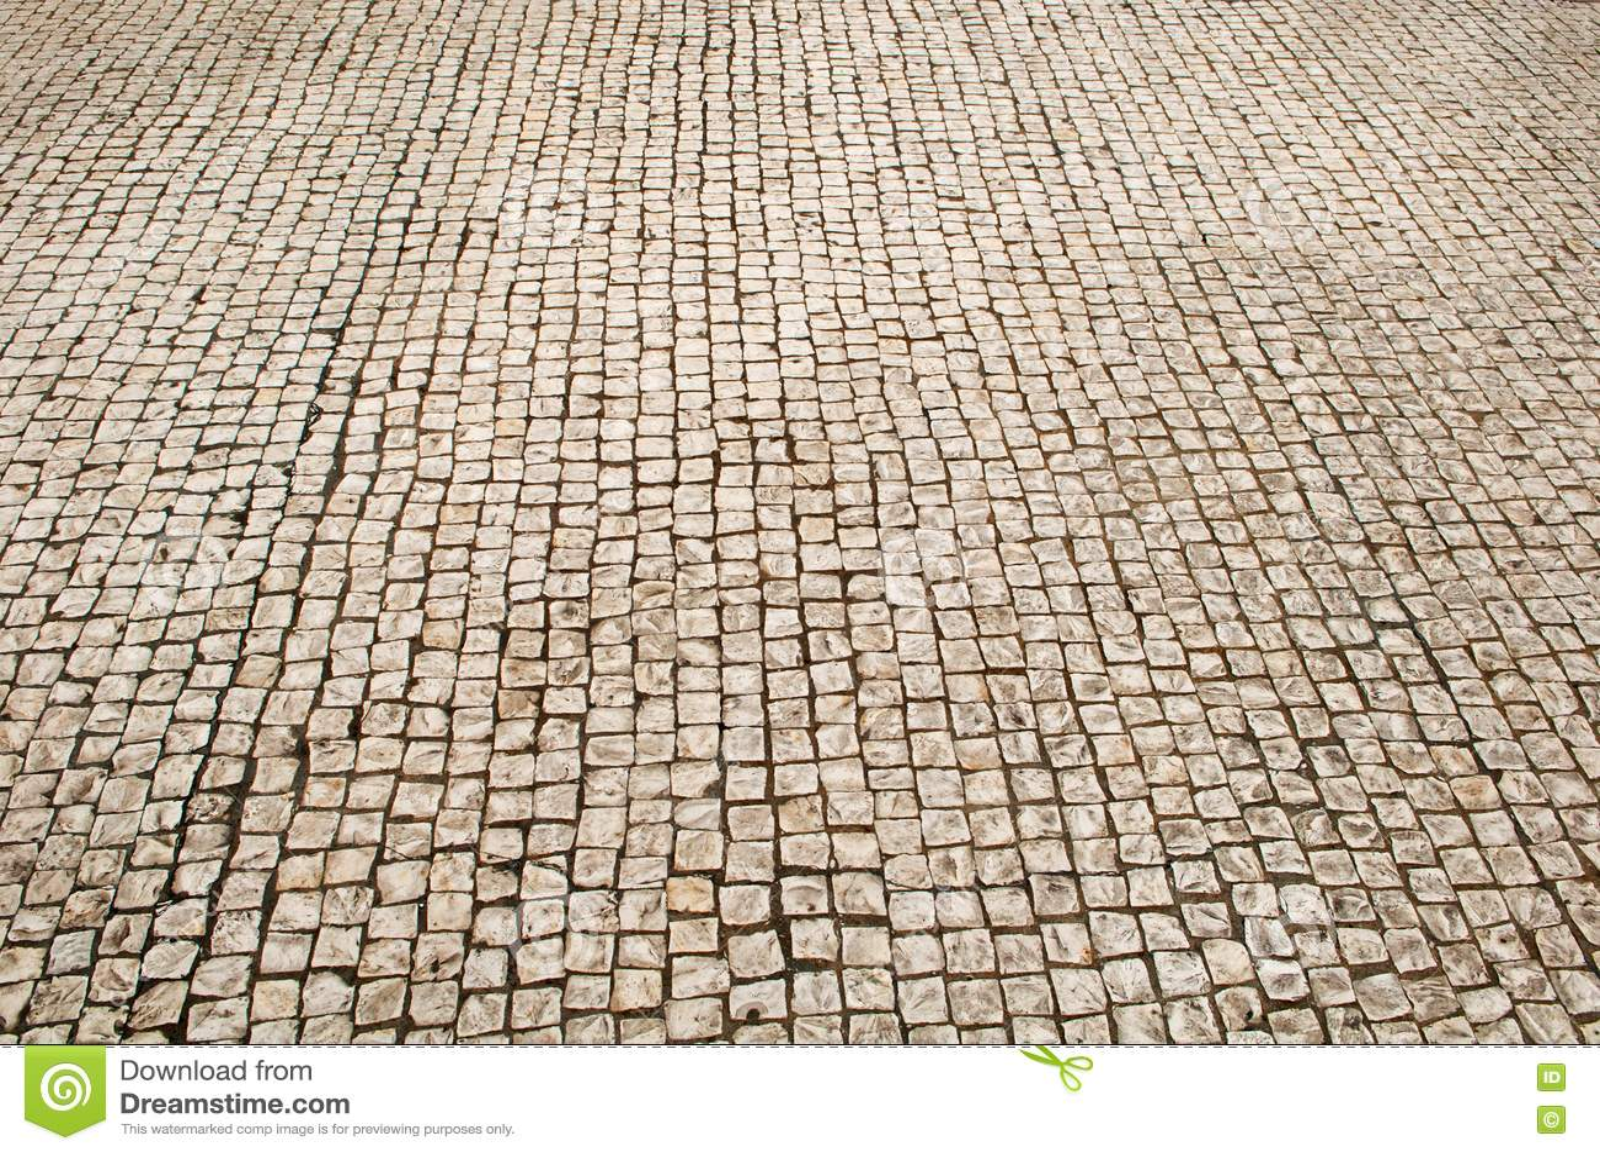 Z Brick Flooring : Brown small brick floor royalty free stock images image